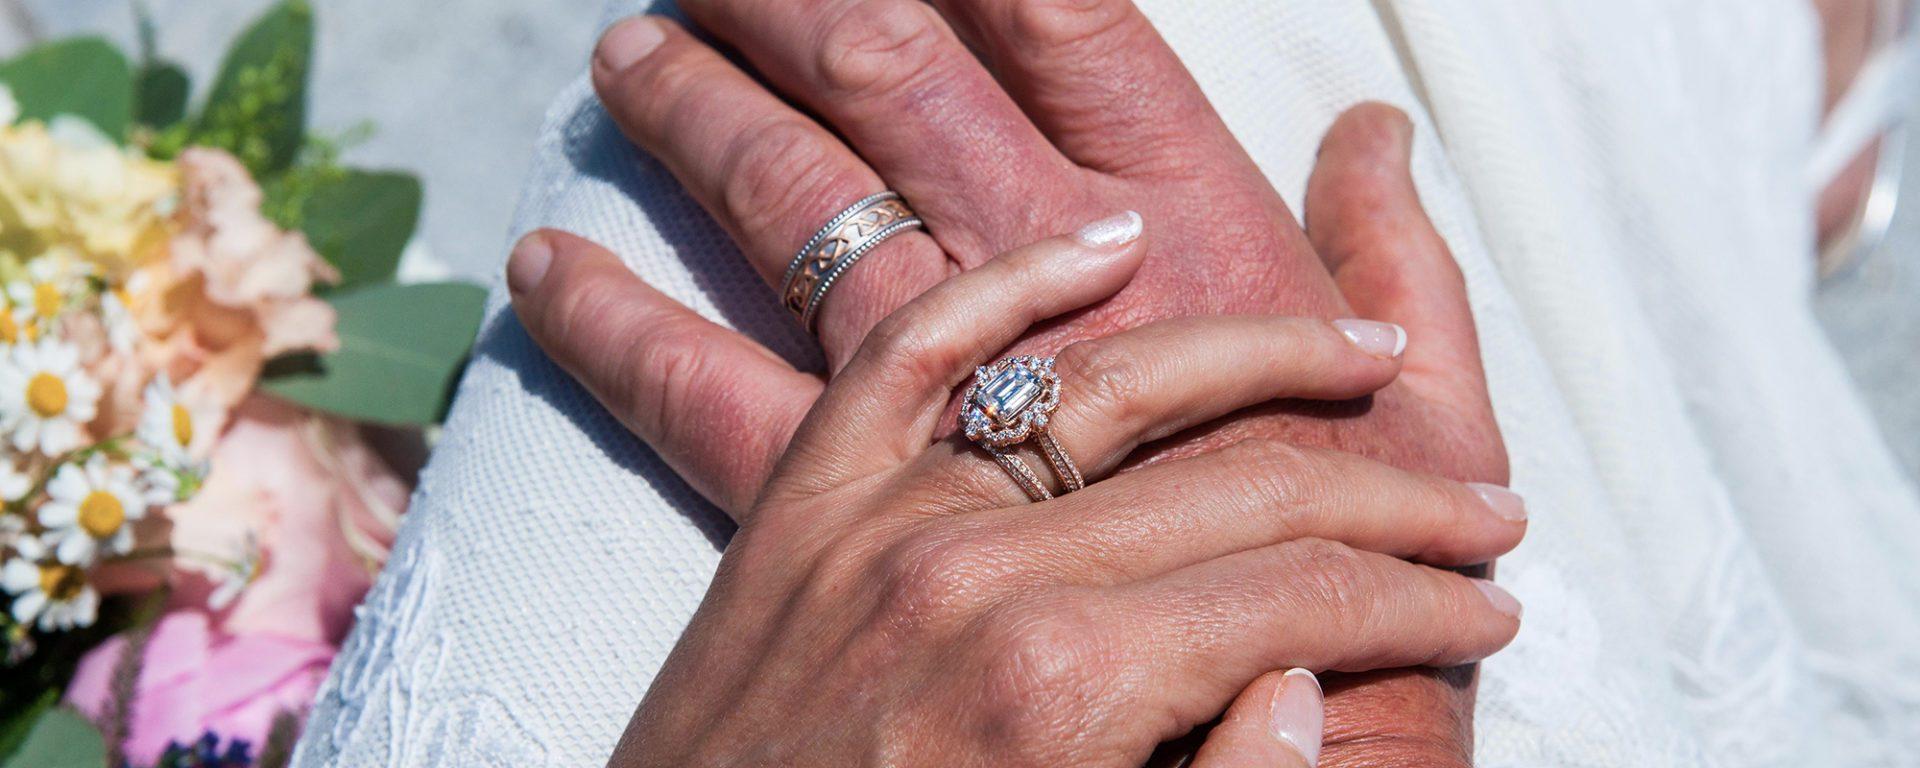 Platinum rose gold engagement ring wedding band